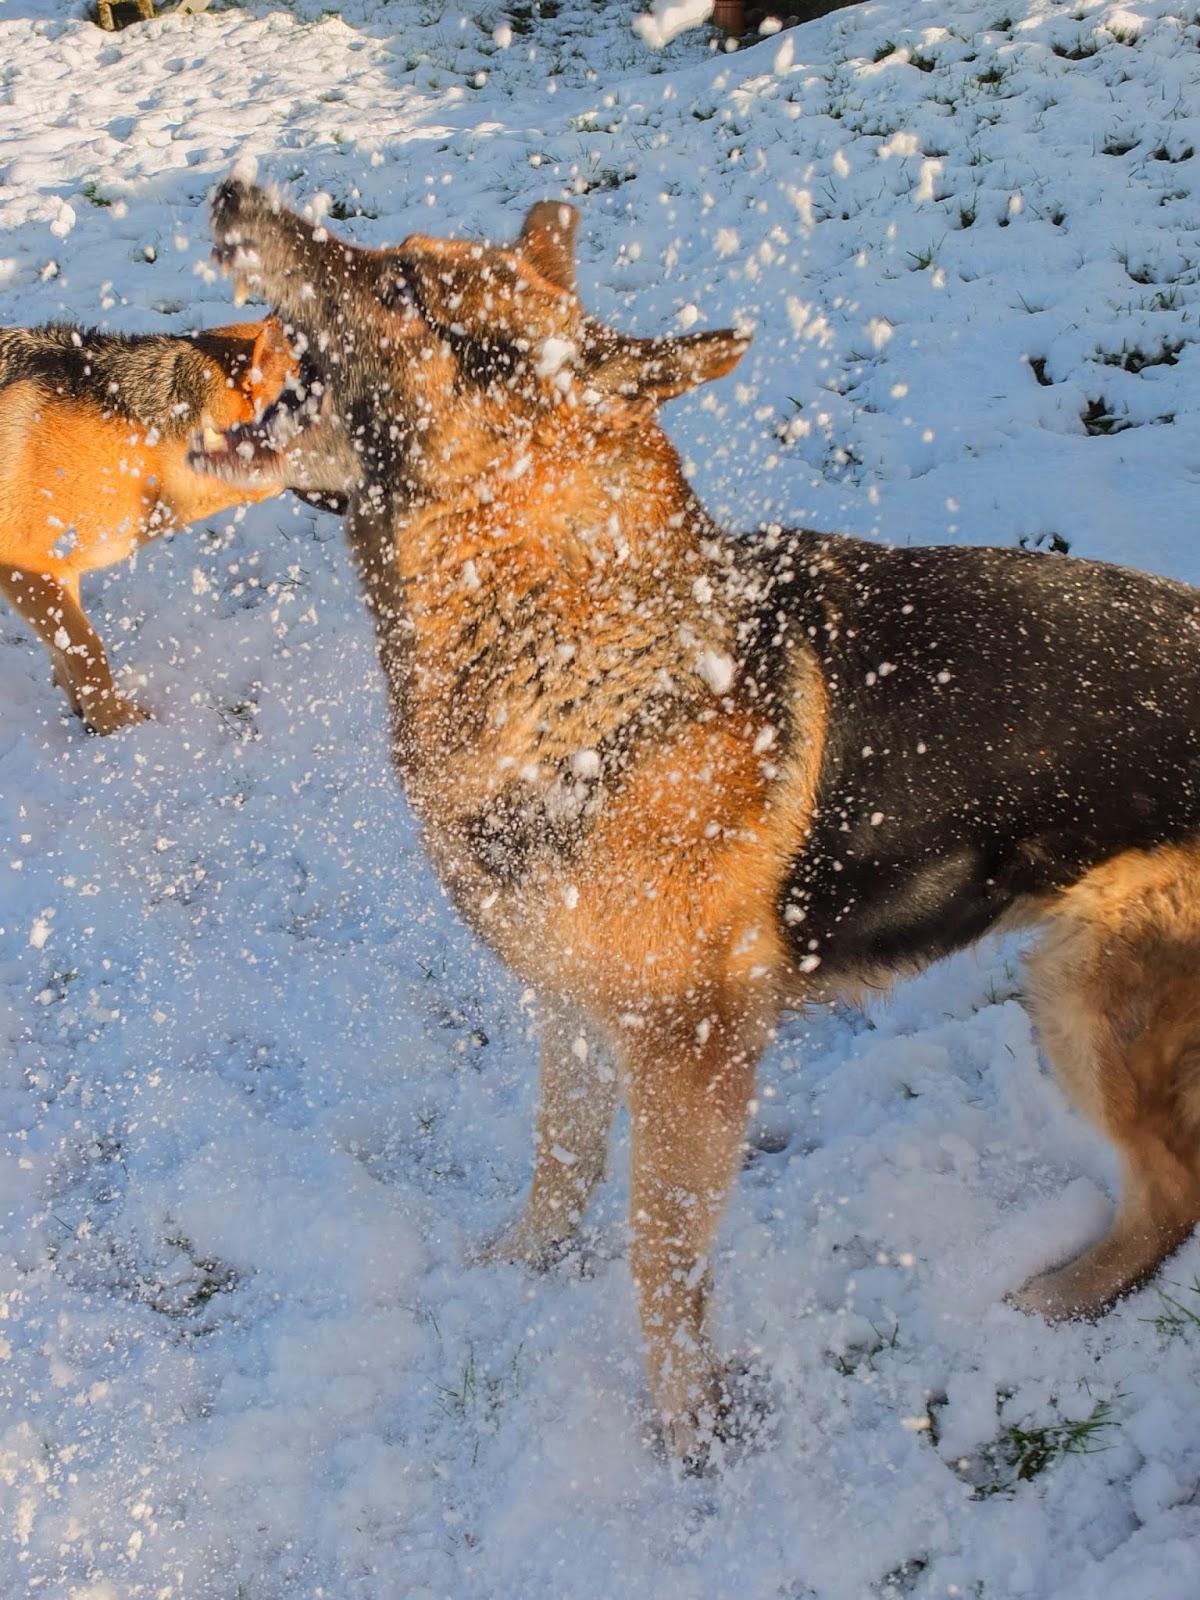 German Shepherd Steve chomping down snowballs in the sunlight.